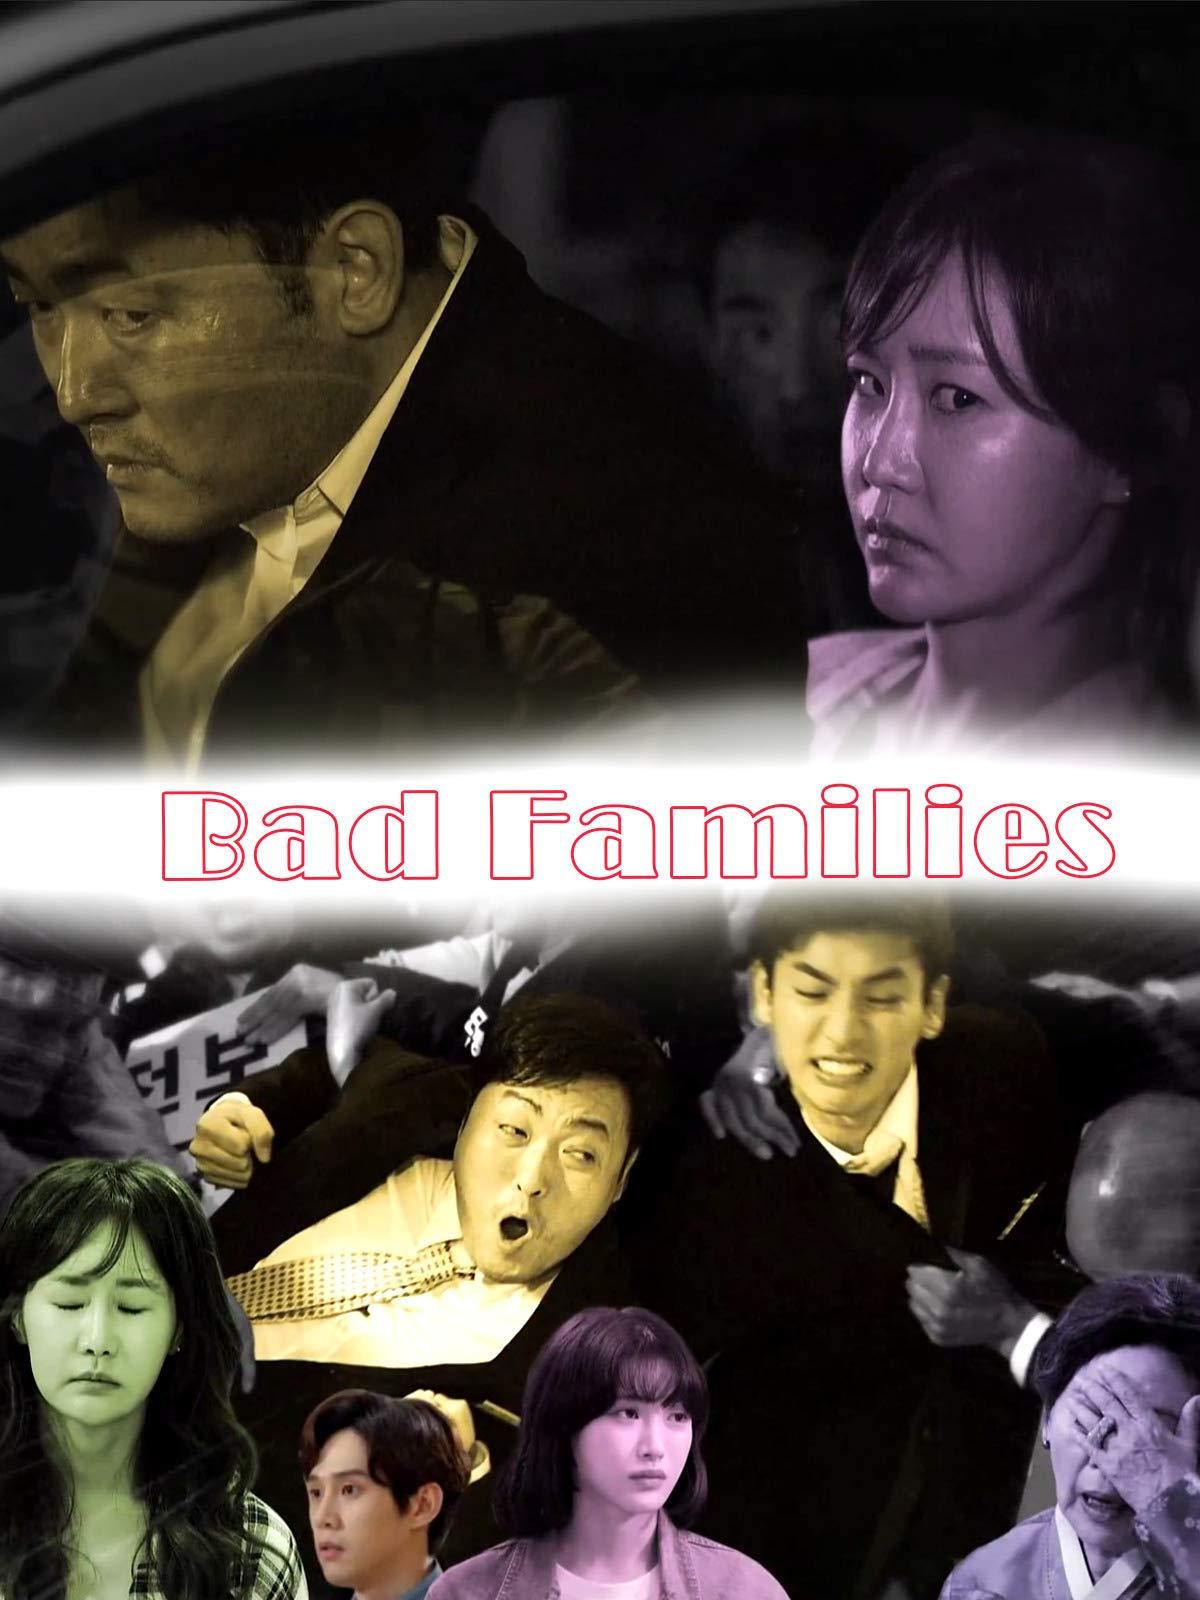 Bad Families